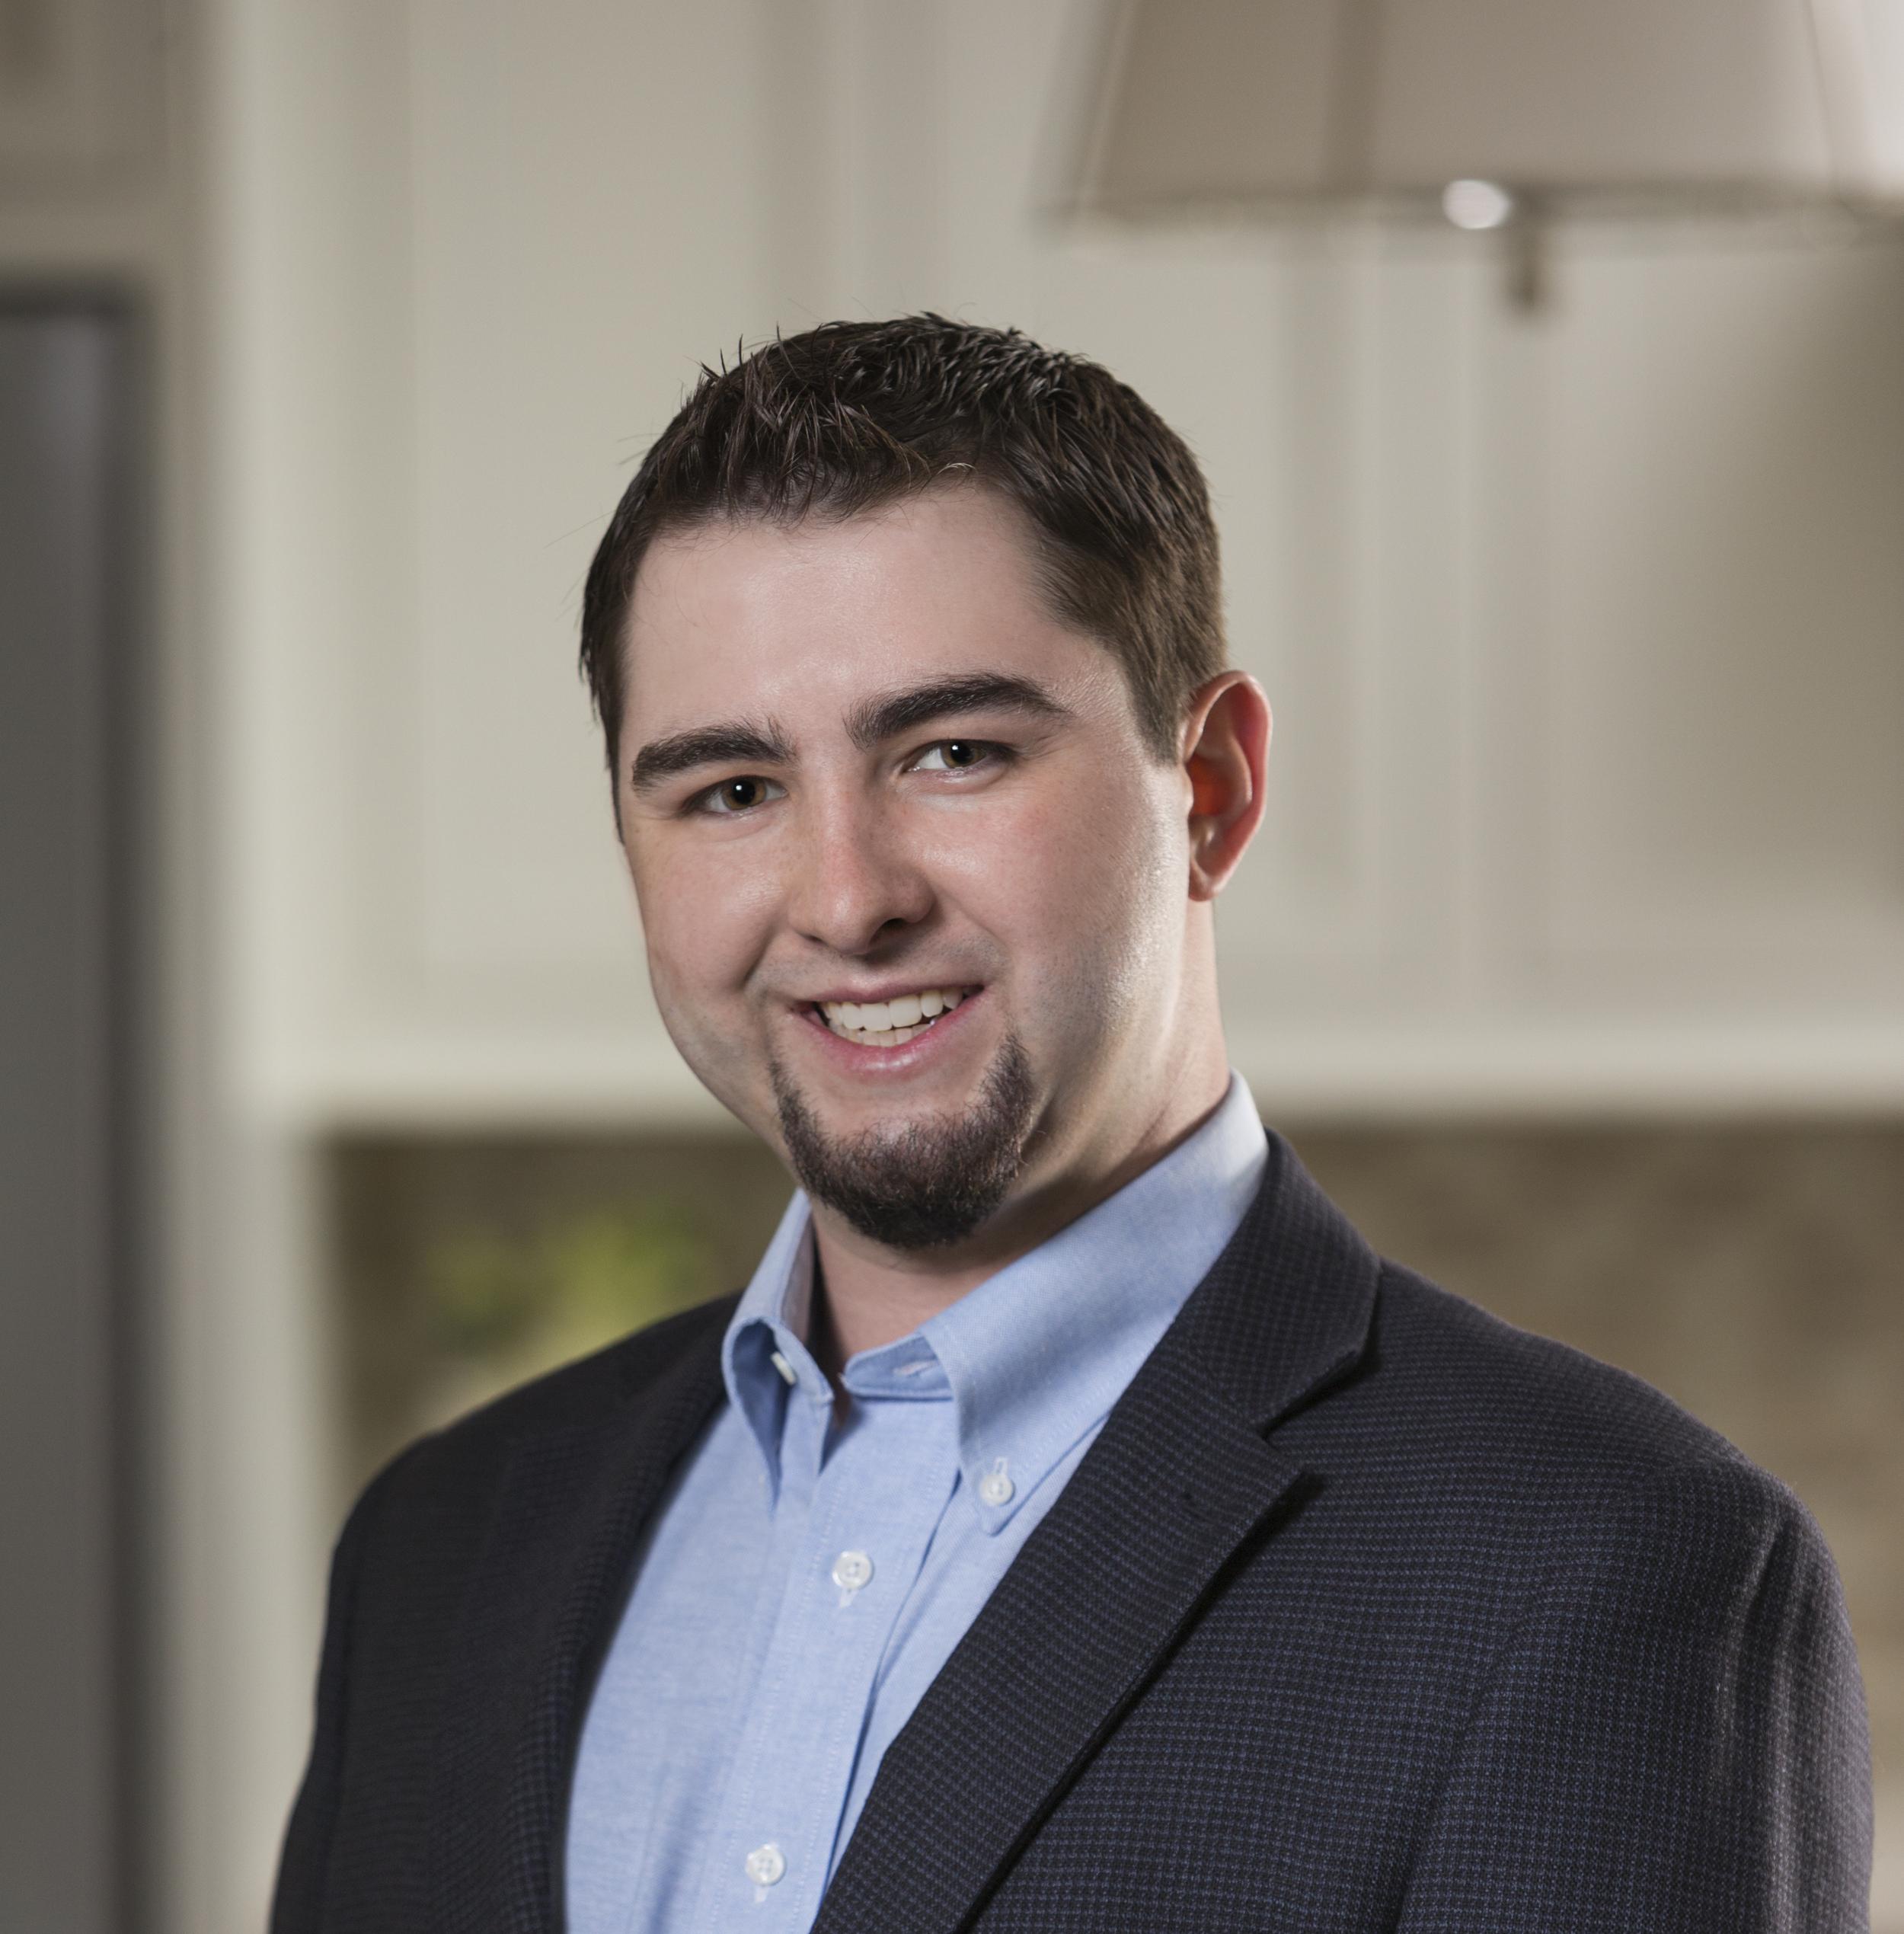 Dan Fitzpatrick   Asst. Project Manager + Service